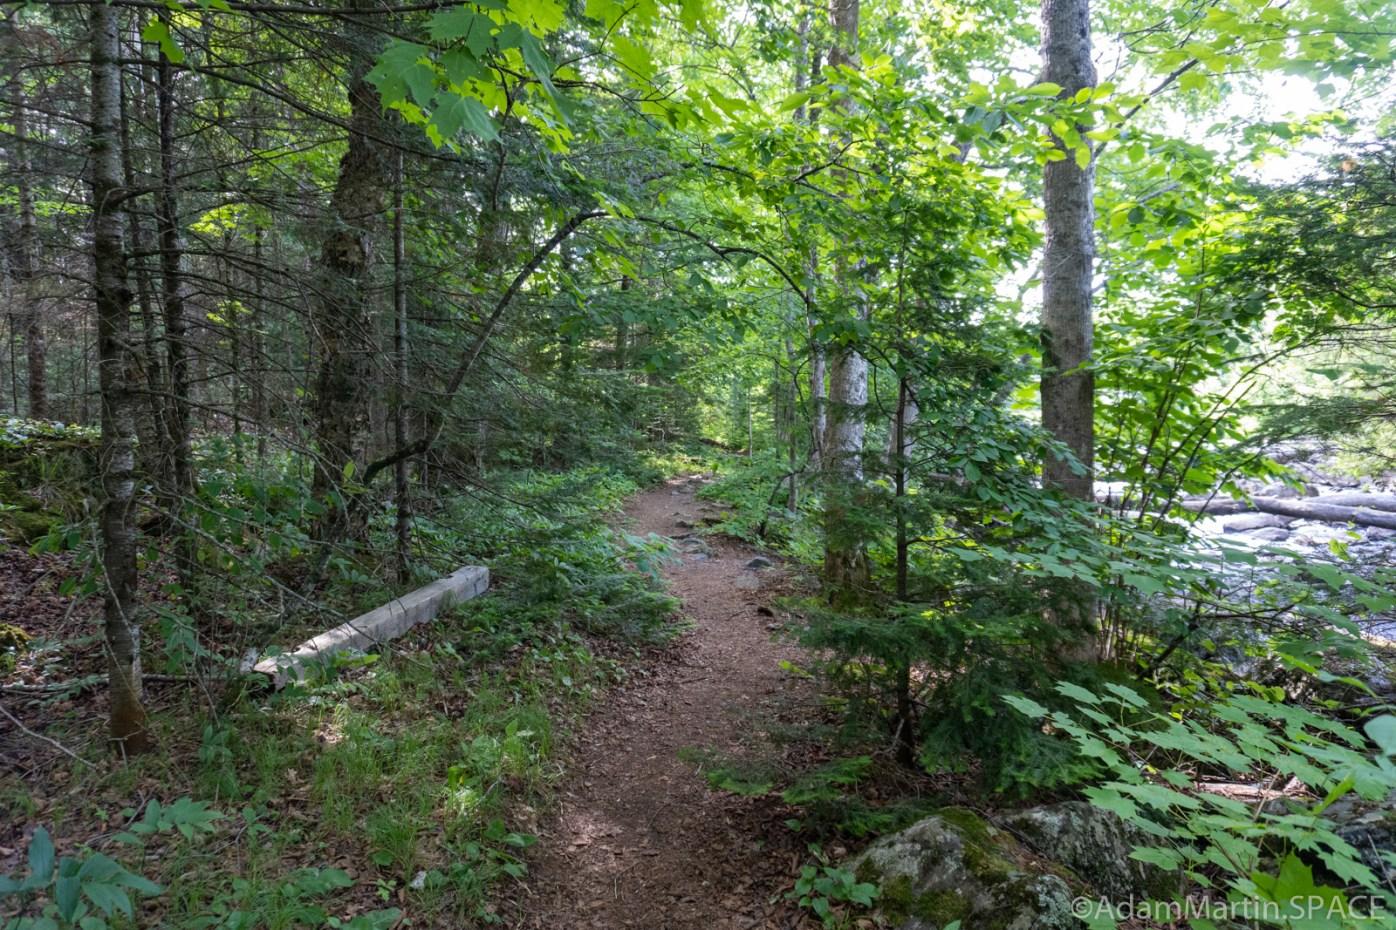 Lake of the Falls - Hiking trail